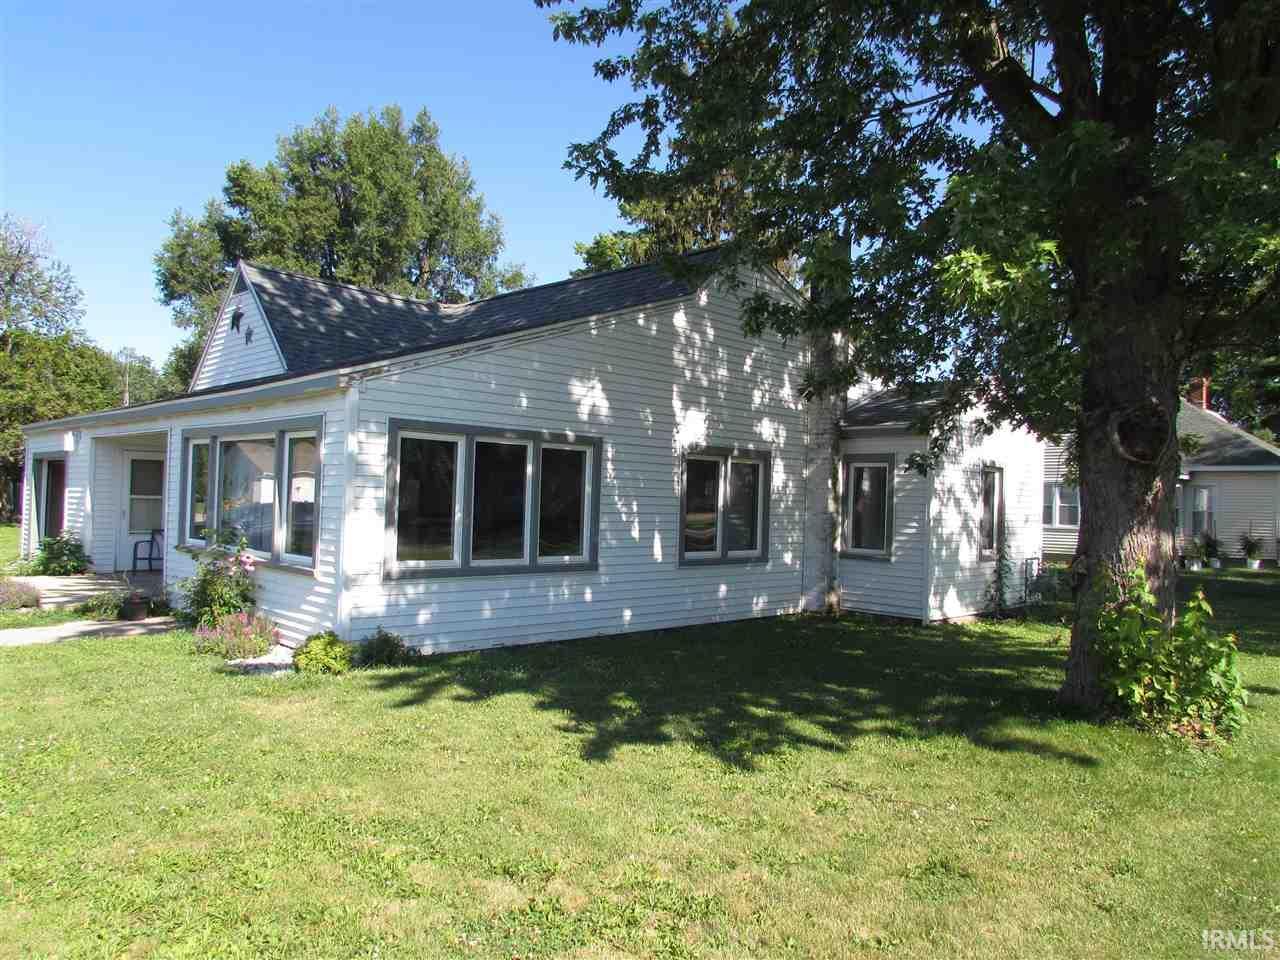 102 W Minnesota, Remington, IN 47977